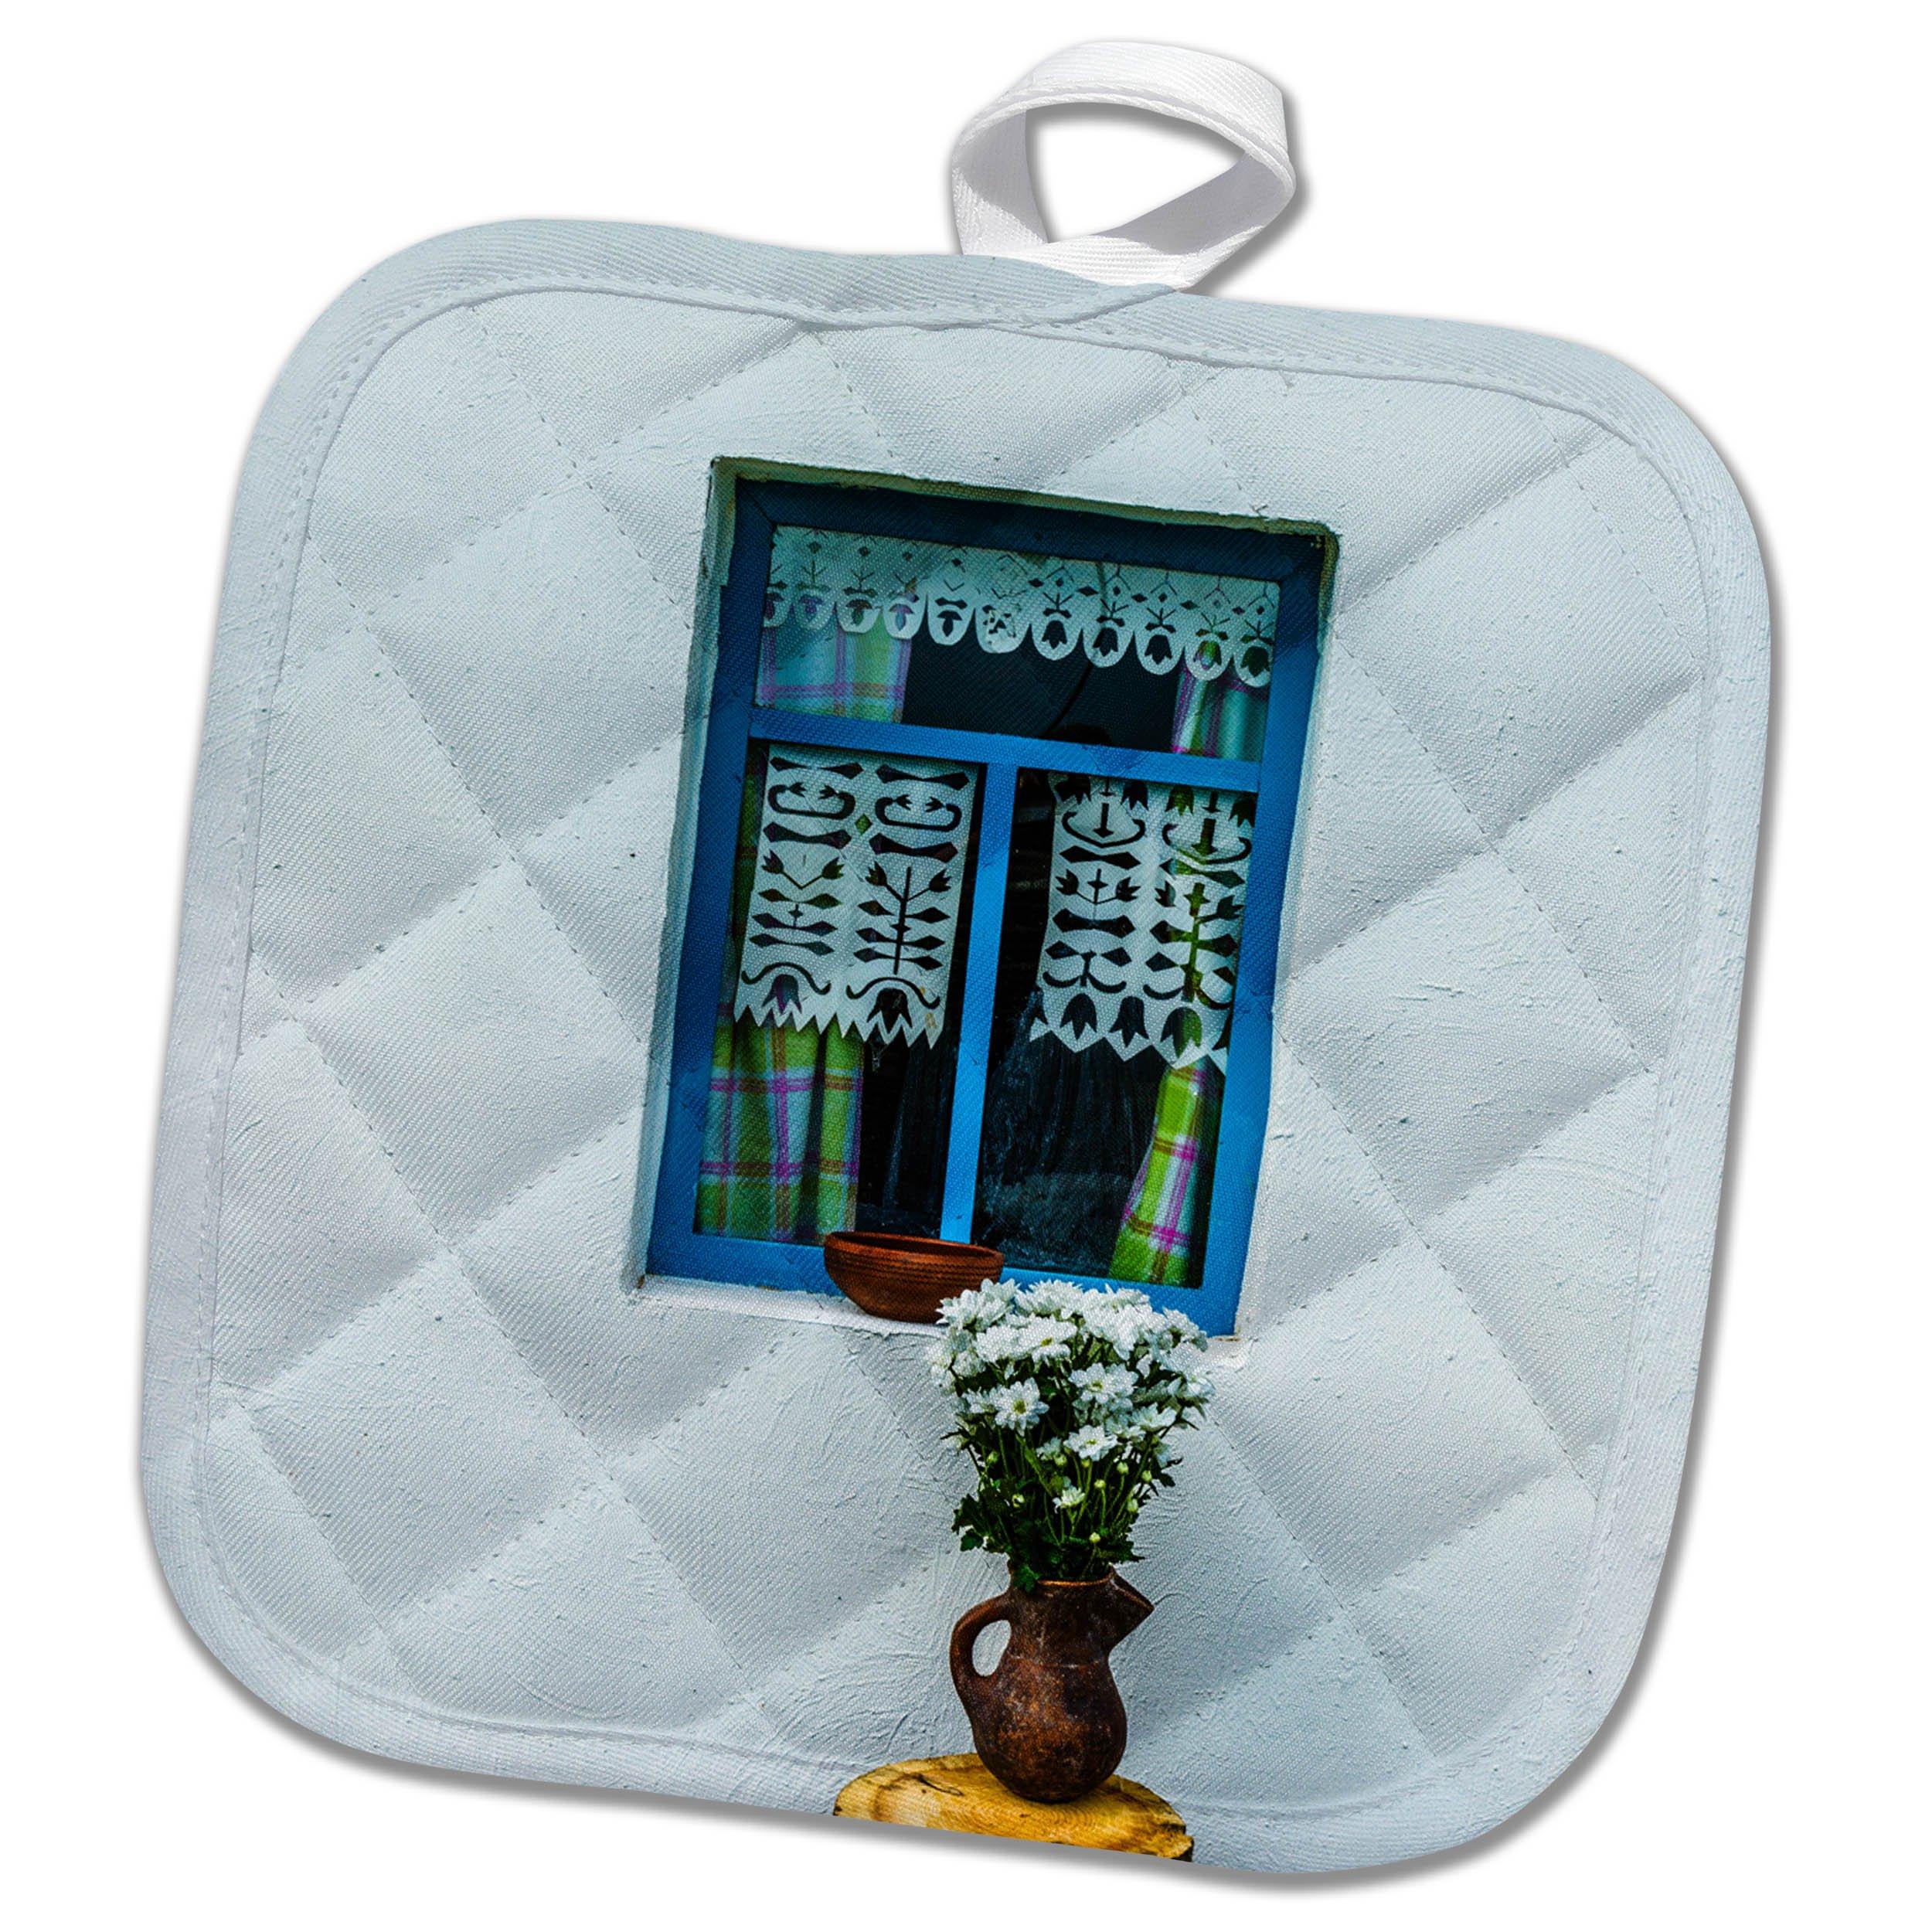 3dRose Alexis Photography - Architecture - White wall, blue window, white flowers, adobe house - 8x8 Potholder (phl_270844_1)